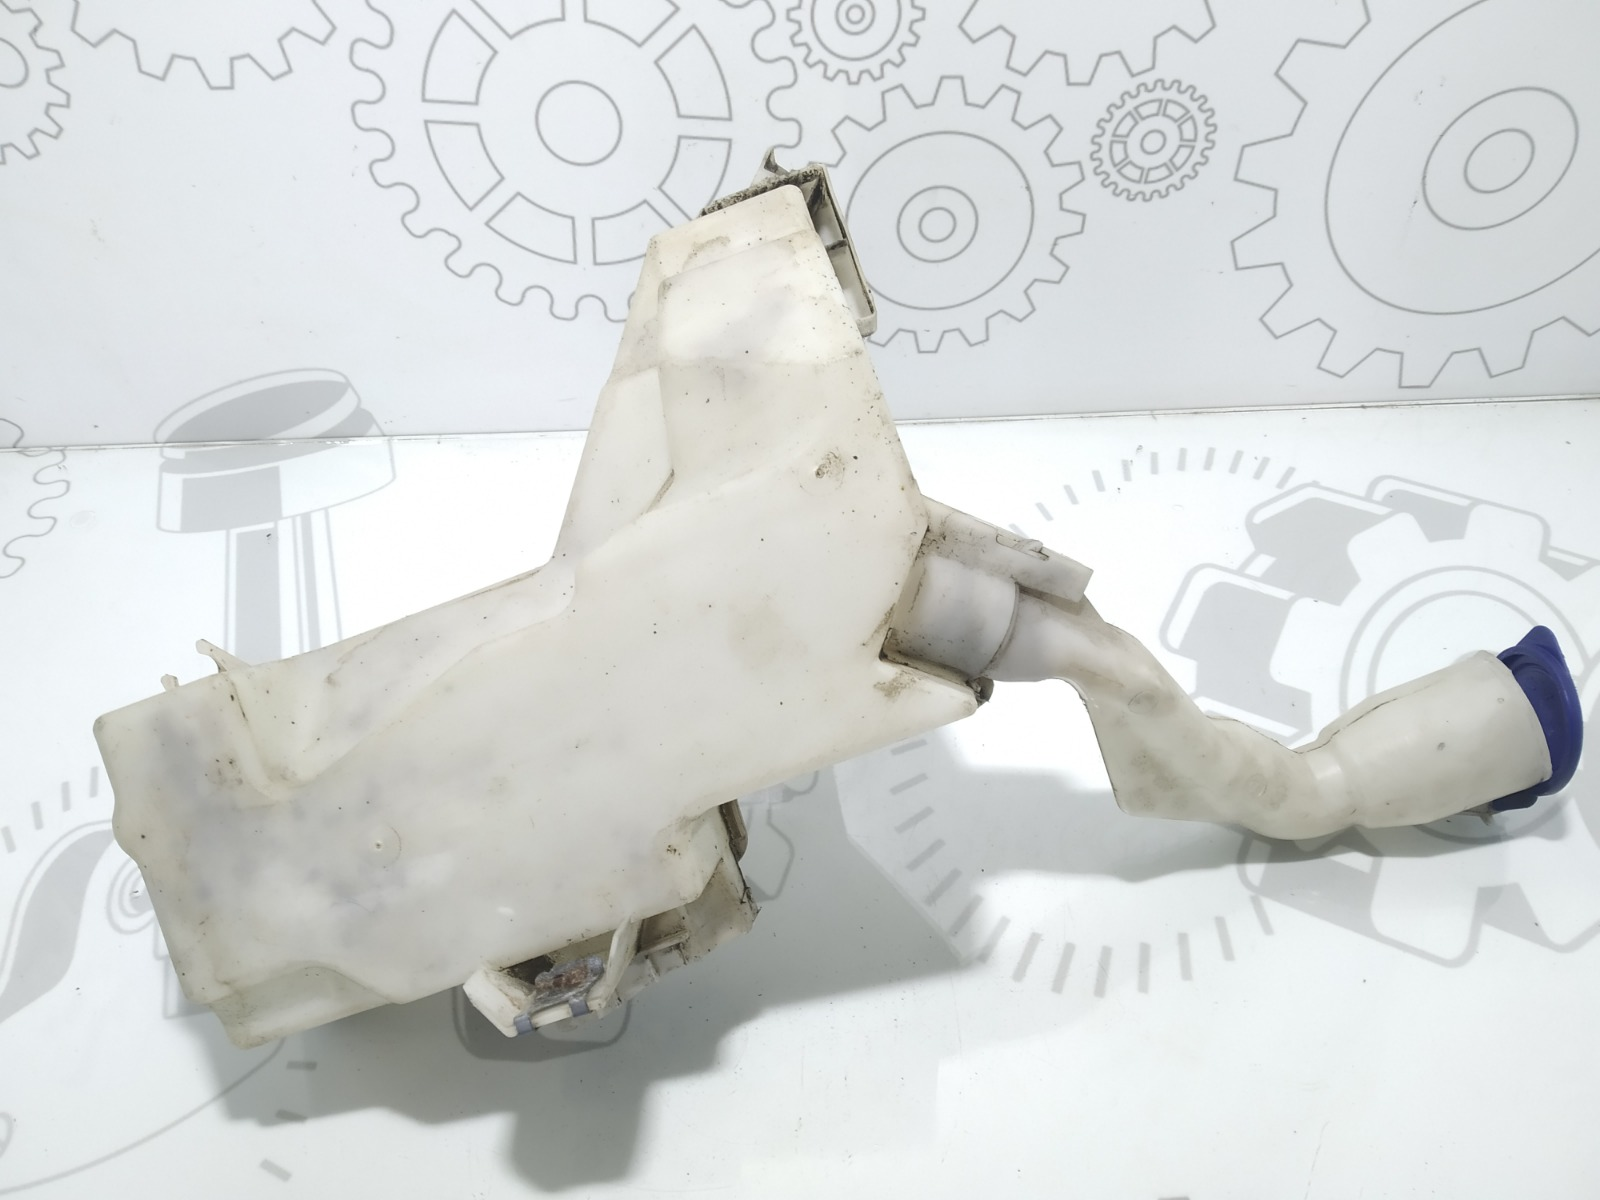 Бачок омывателя Peugeot 407 2.0 HDI 2007 (б/у)